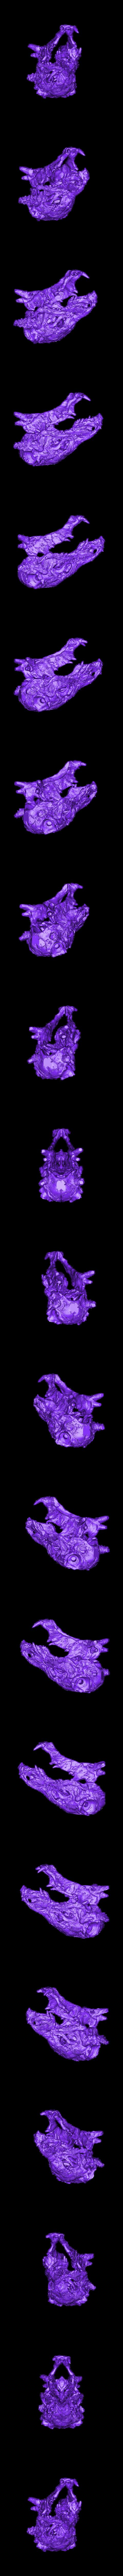 MiniDragonSkull.stl Download free STL file Dragon Skull • 3D printable object, JackieMake